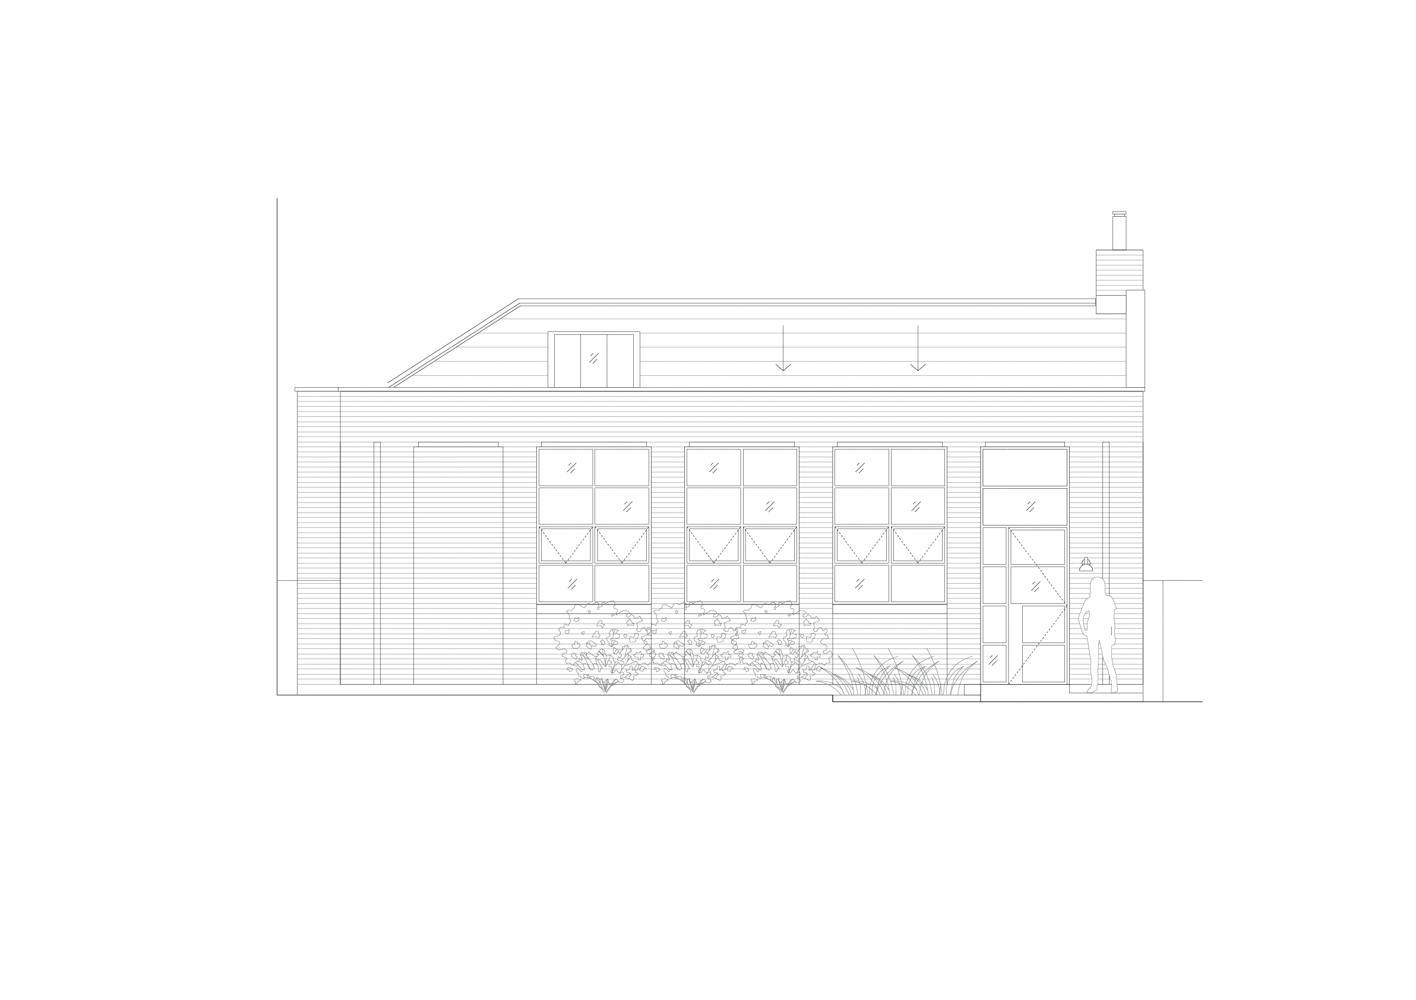 defoe-road-paper-house-project-the-design-emotive-22.jpg